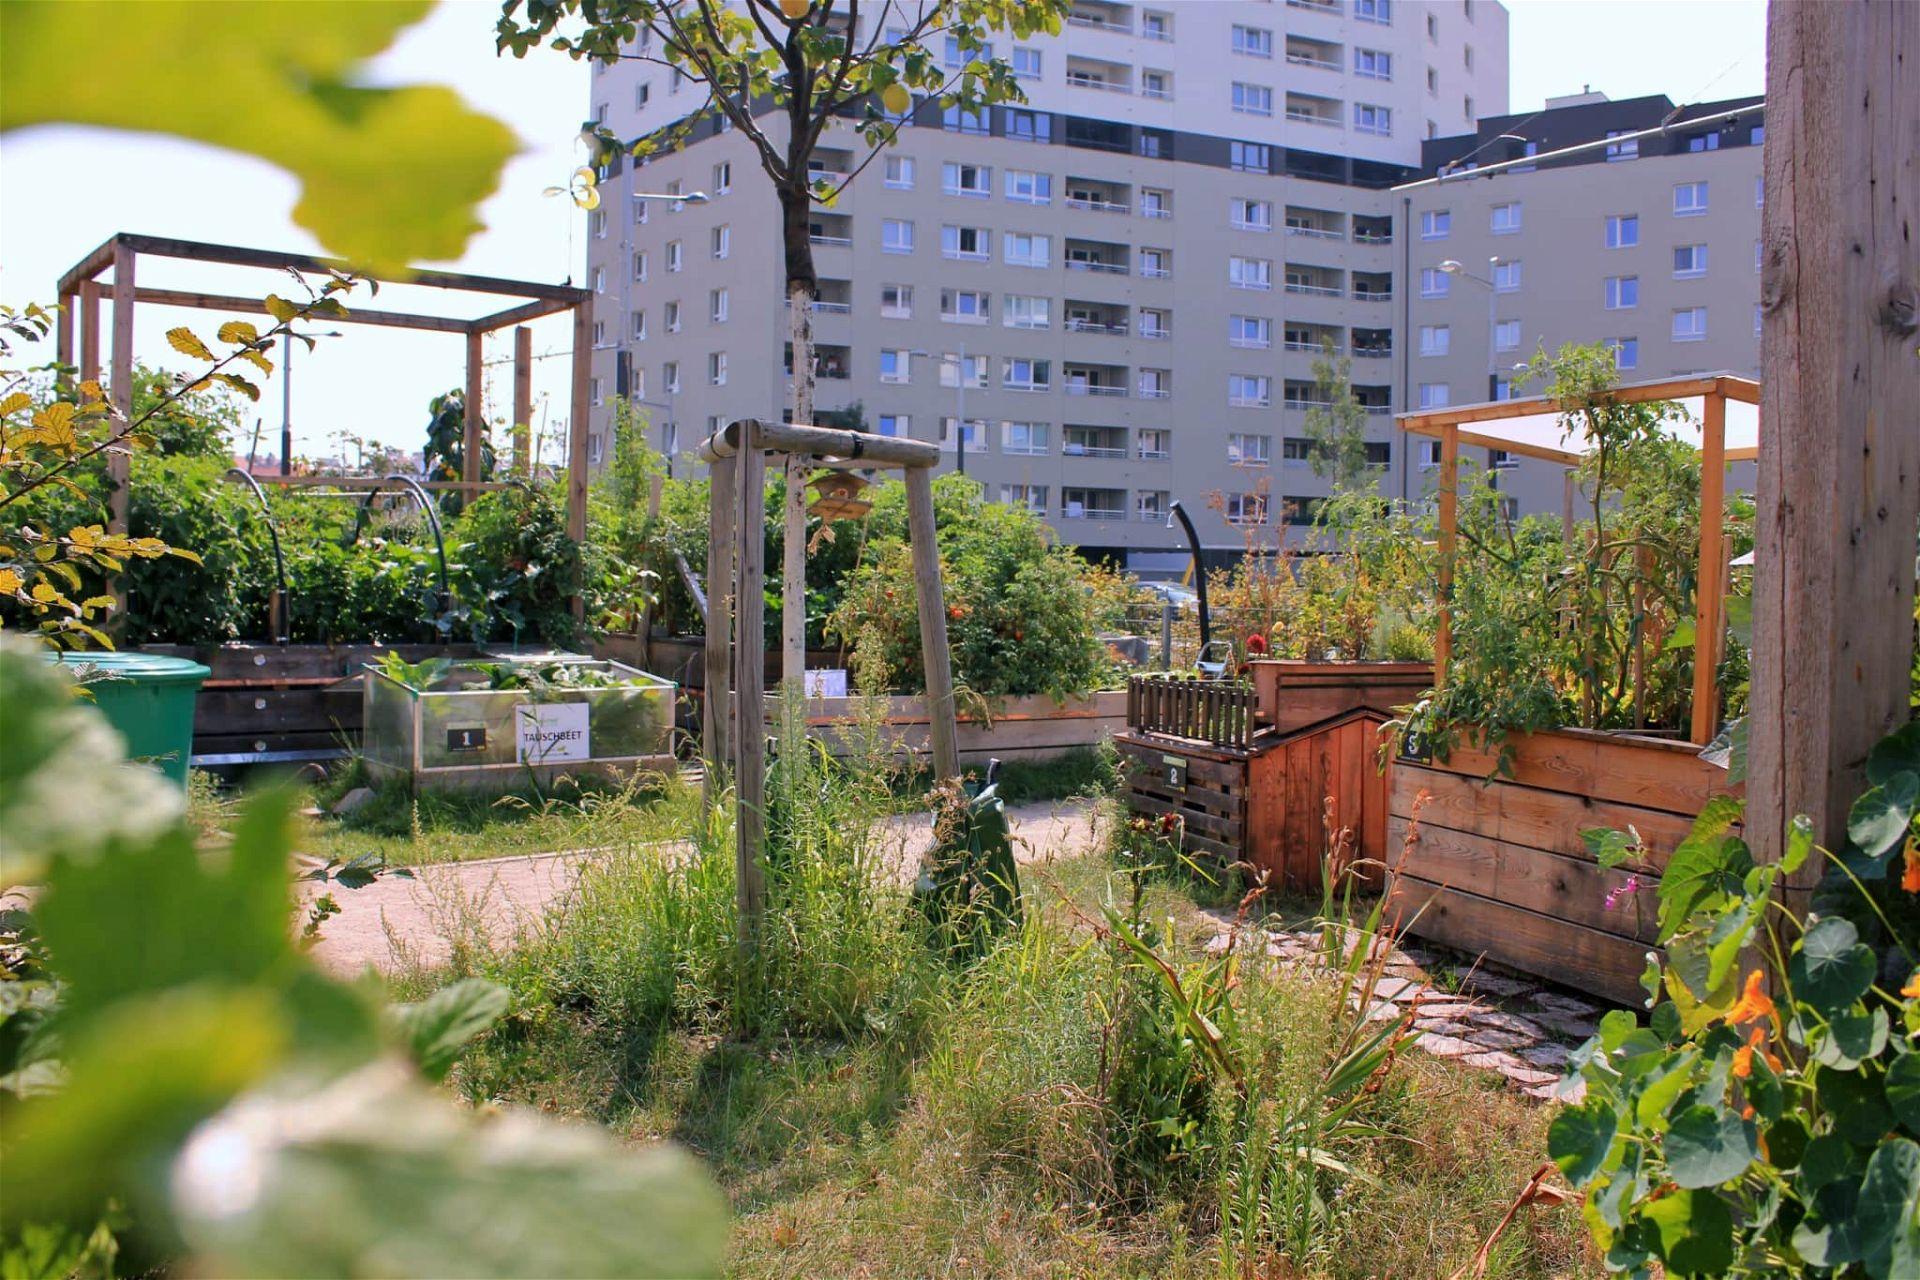 Sonnwendgarten